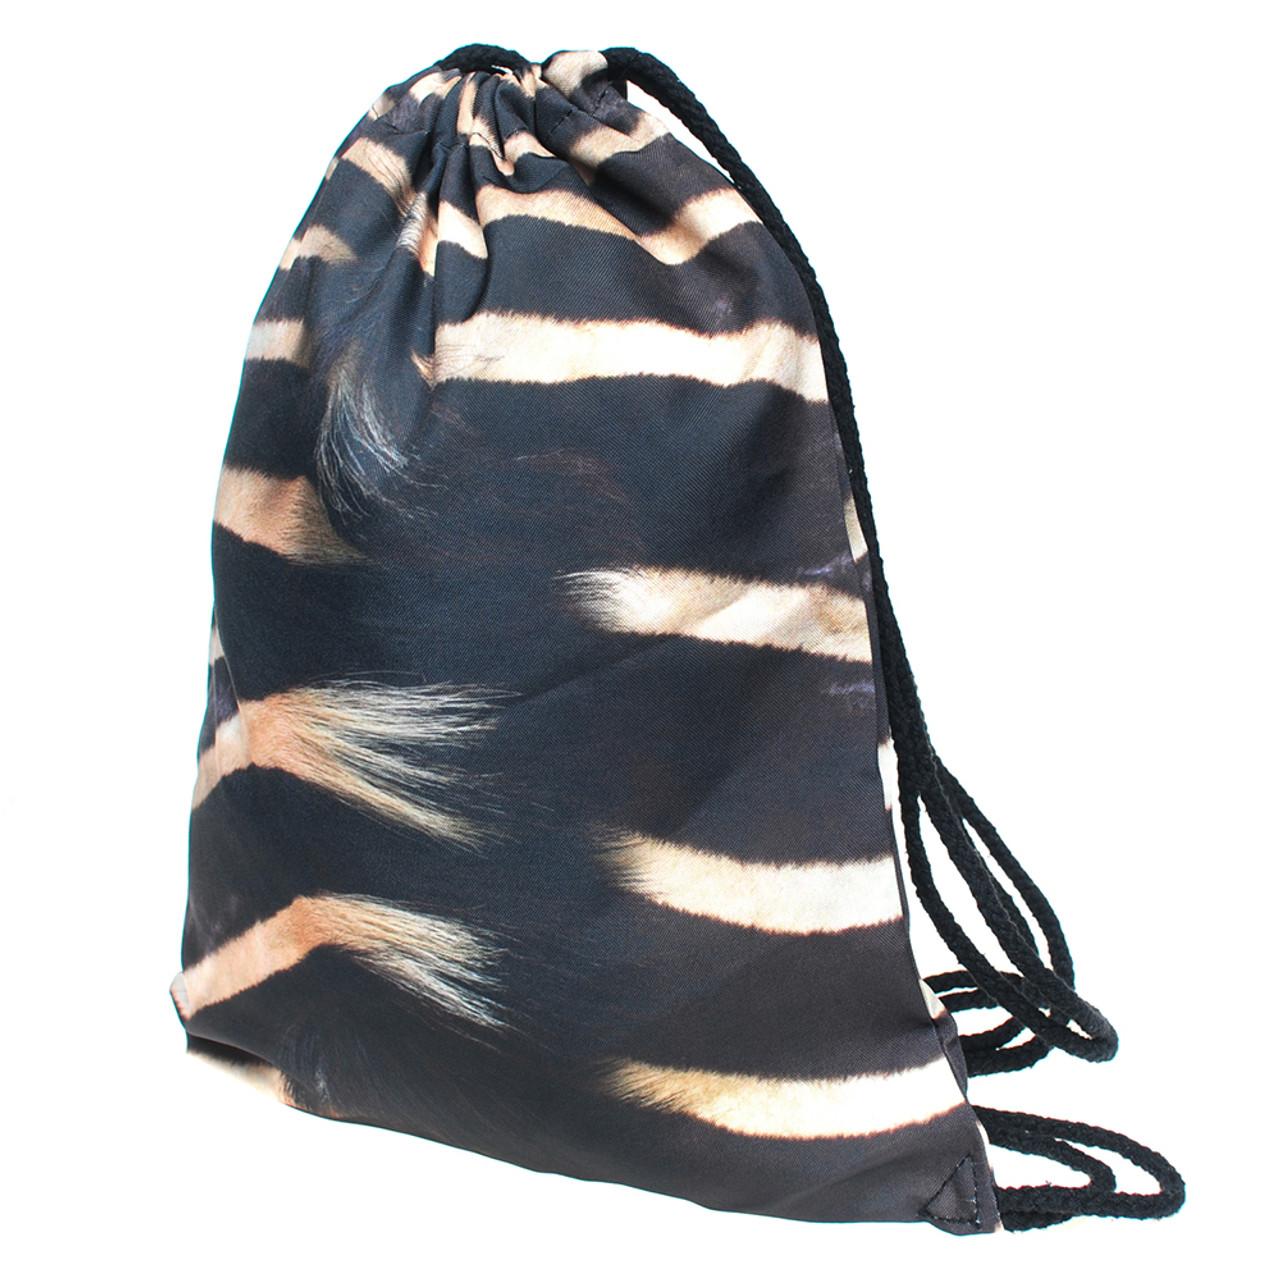 Zebra Graphic Print Drawstring Sack Backpack - 28 Styles